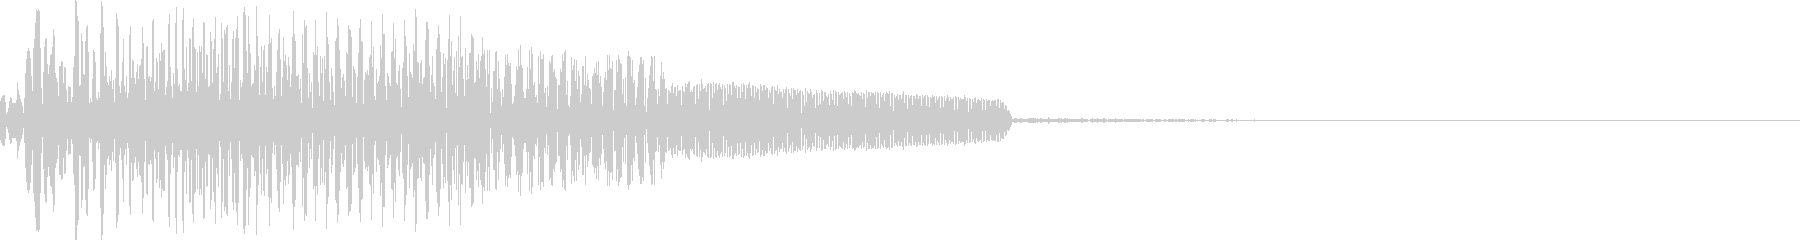 SF風 機械操作 選択音の未再生の波形